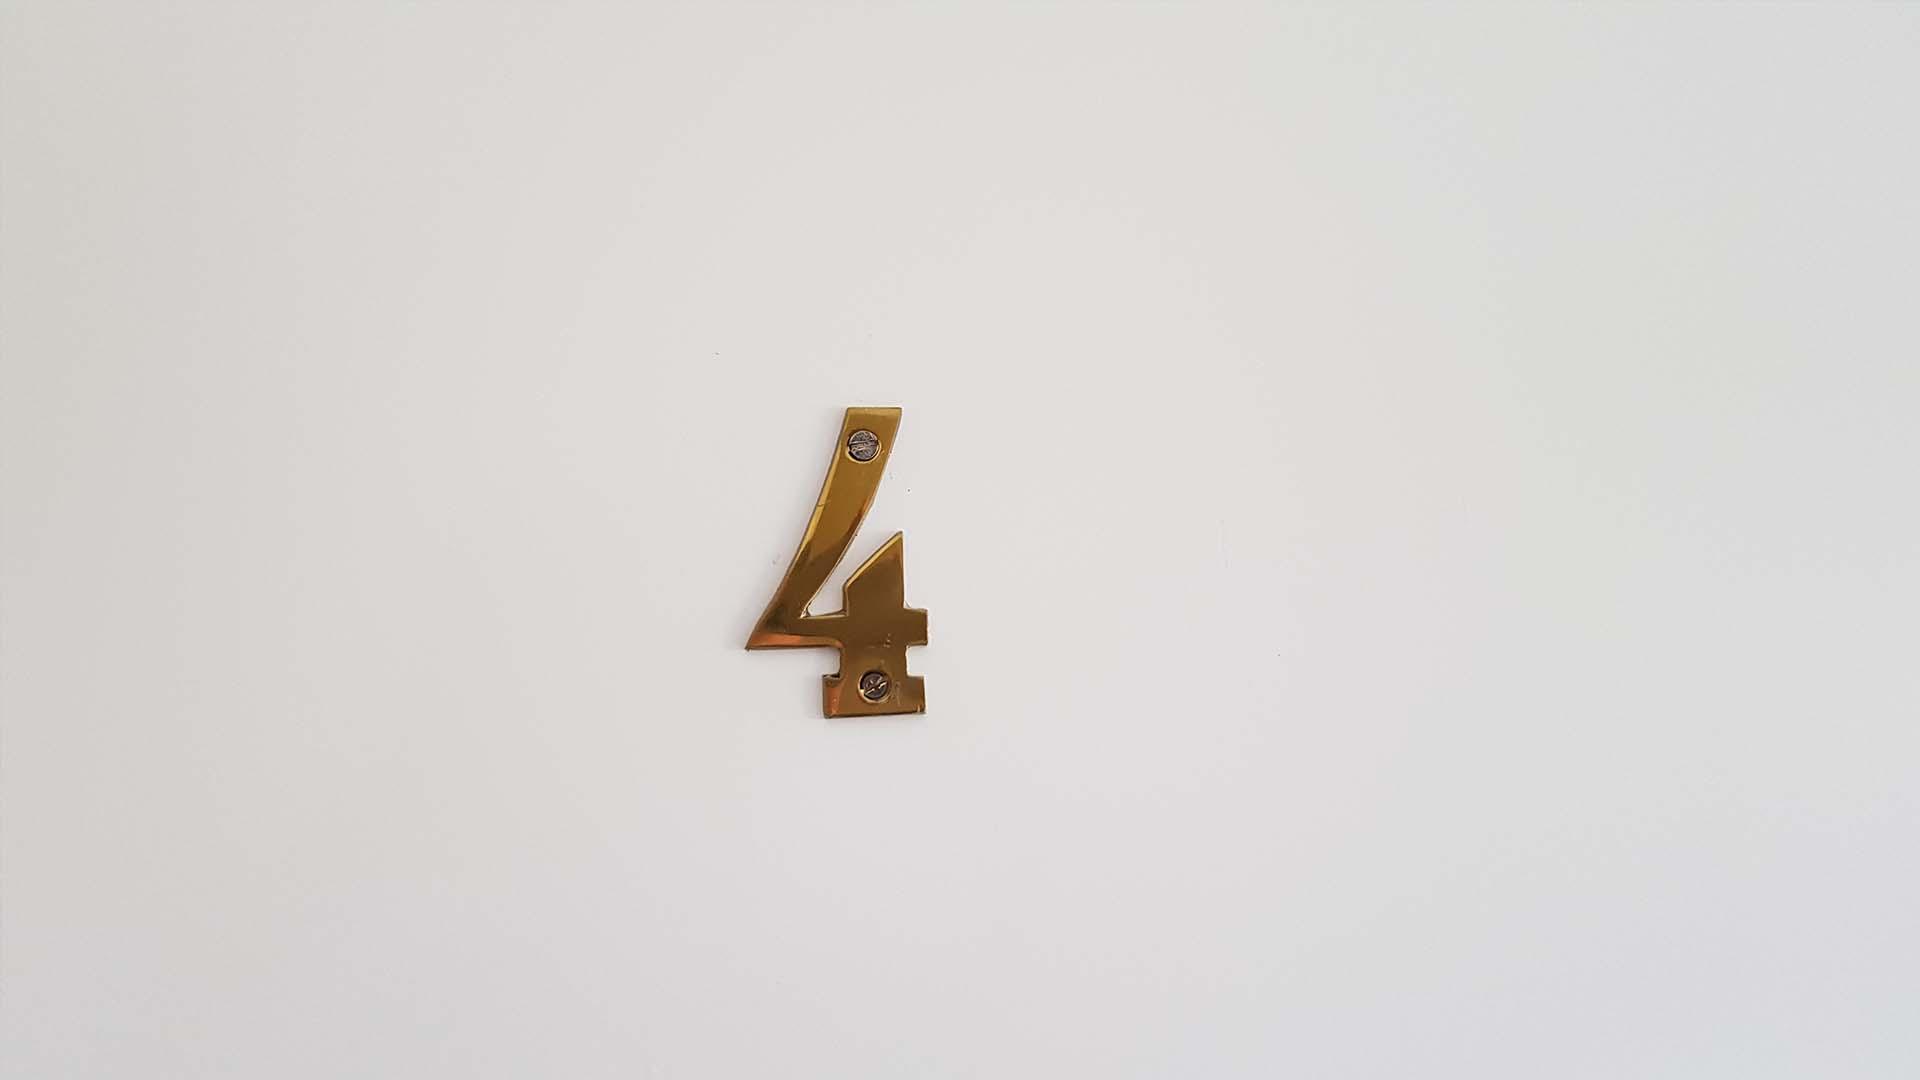 kamer 4 B&B Plompetorenzicht Schouwen-Duiveland Zeeland